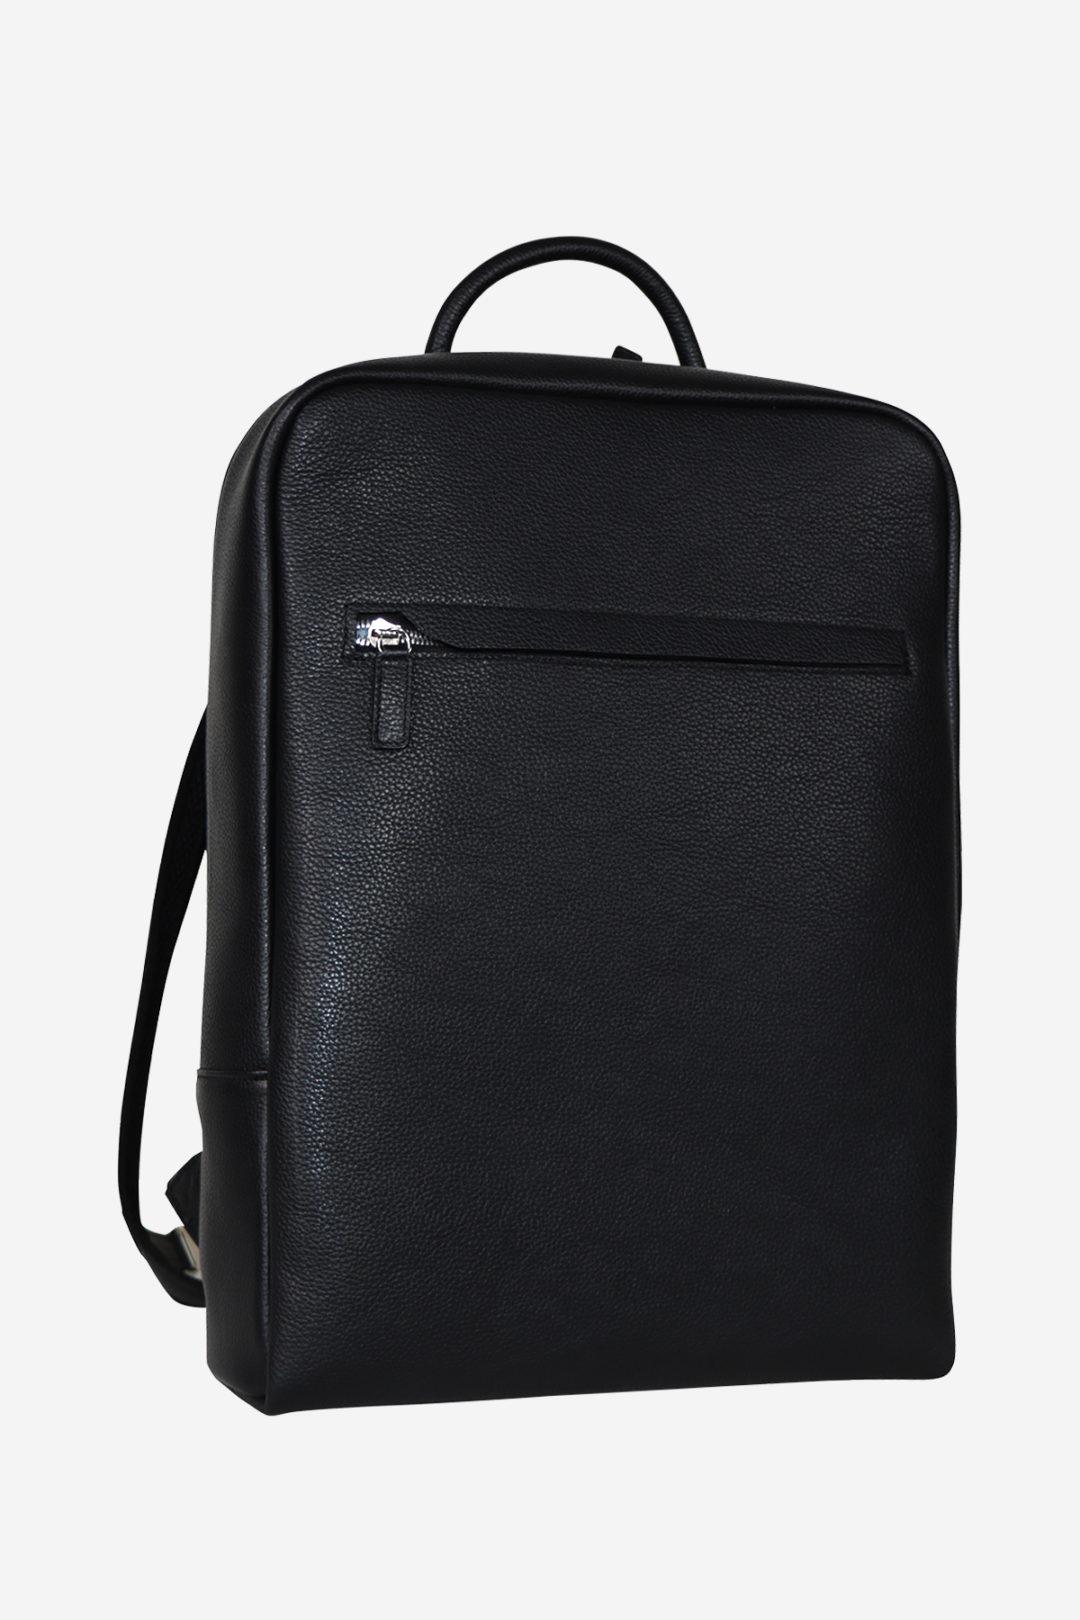 Sinuous Laptop Backpack black waterproof leather